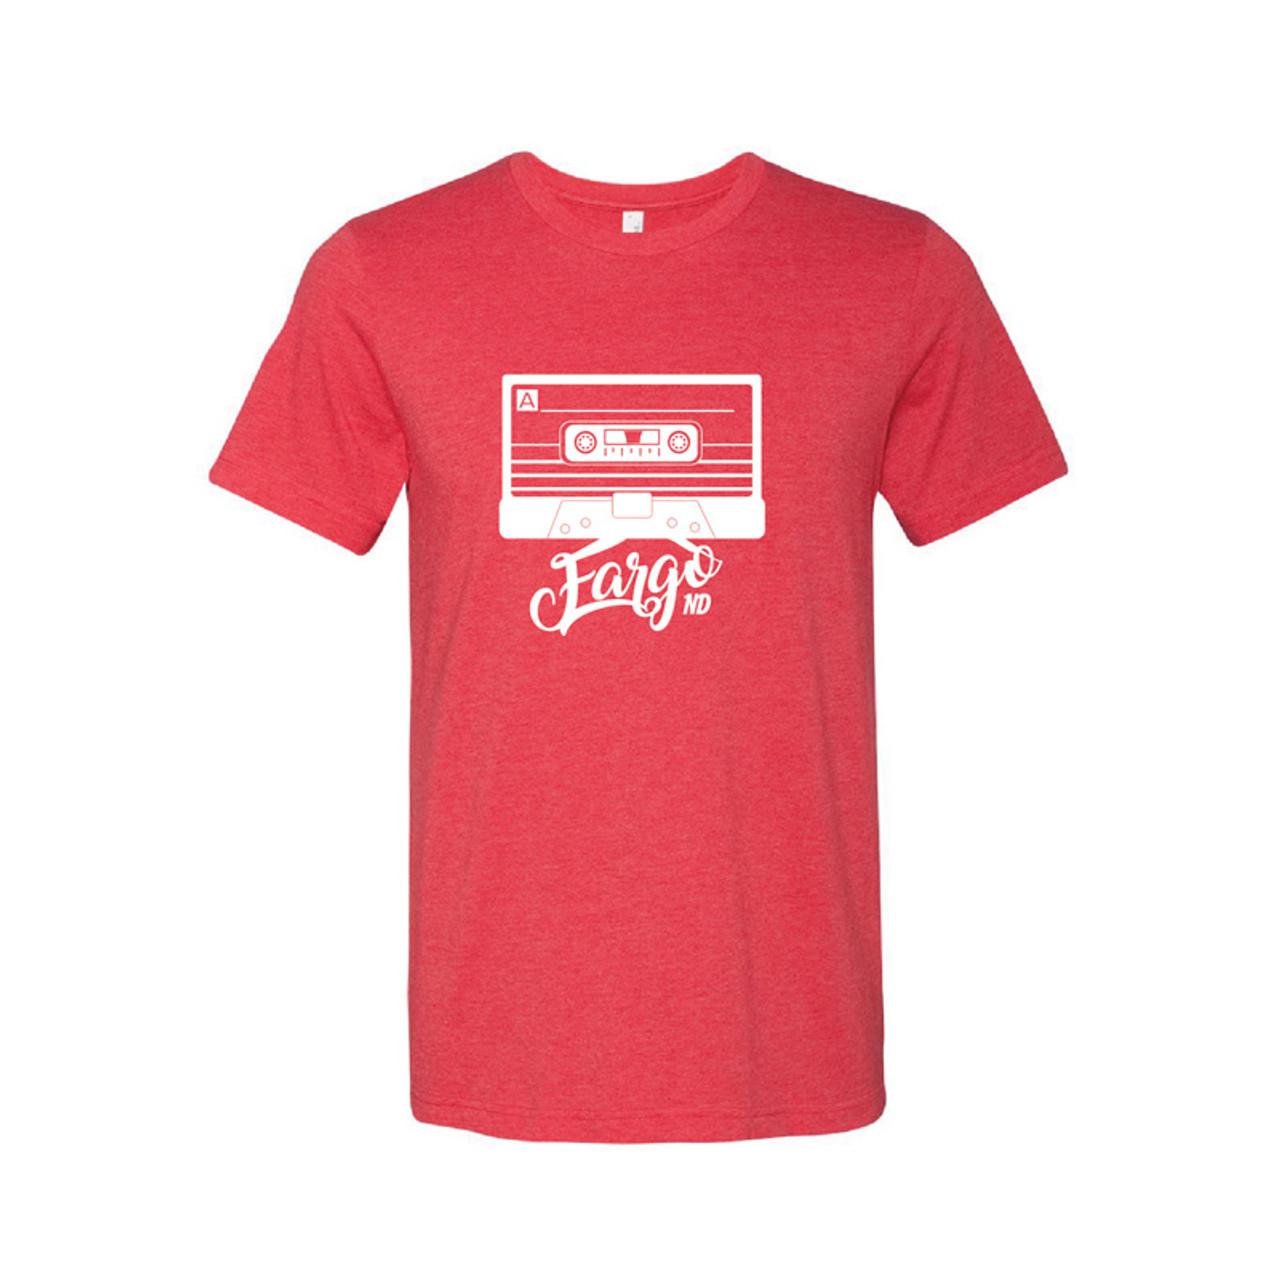 retro tee shirts